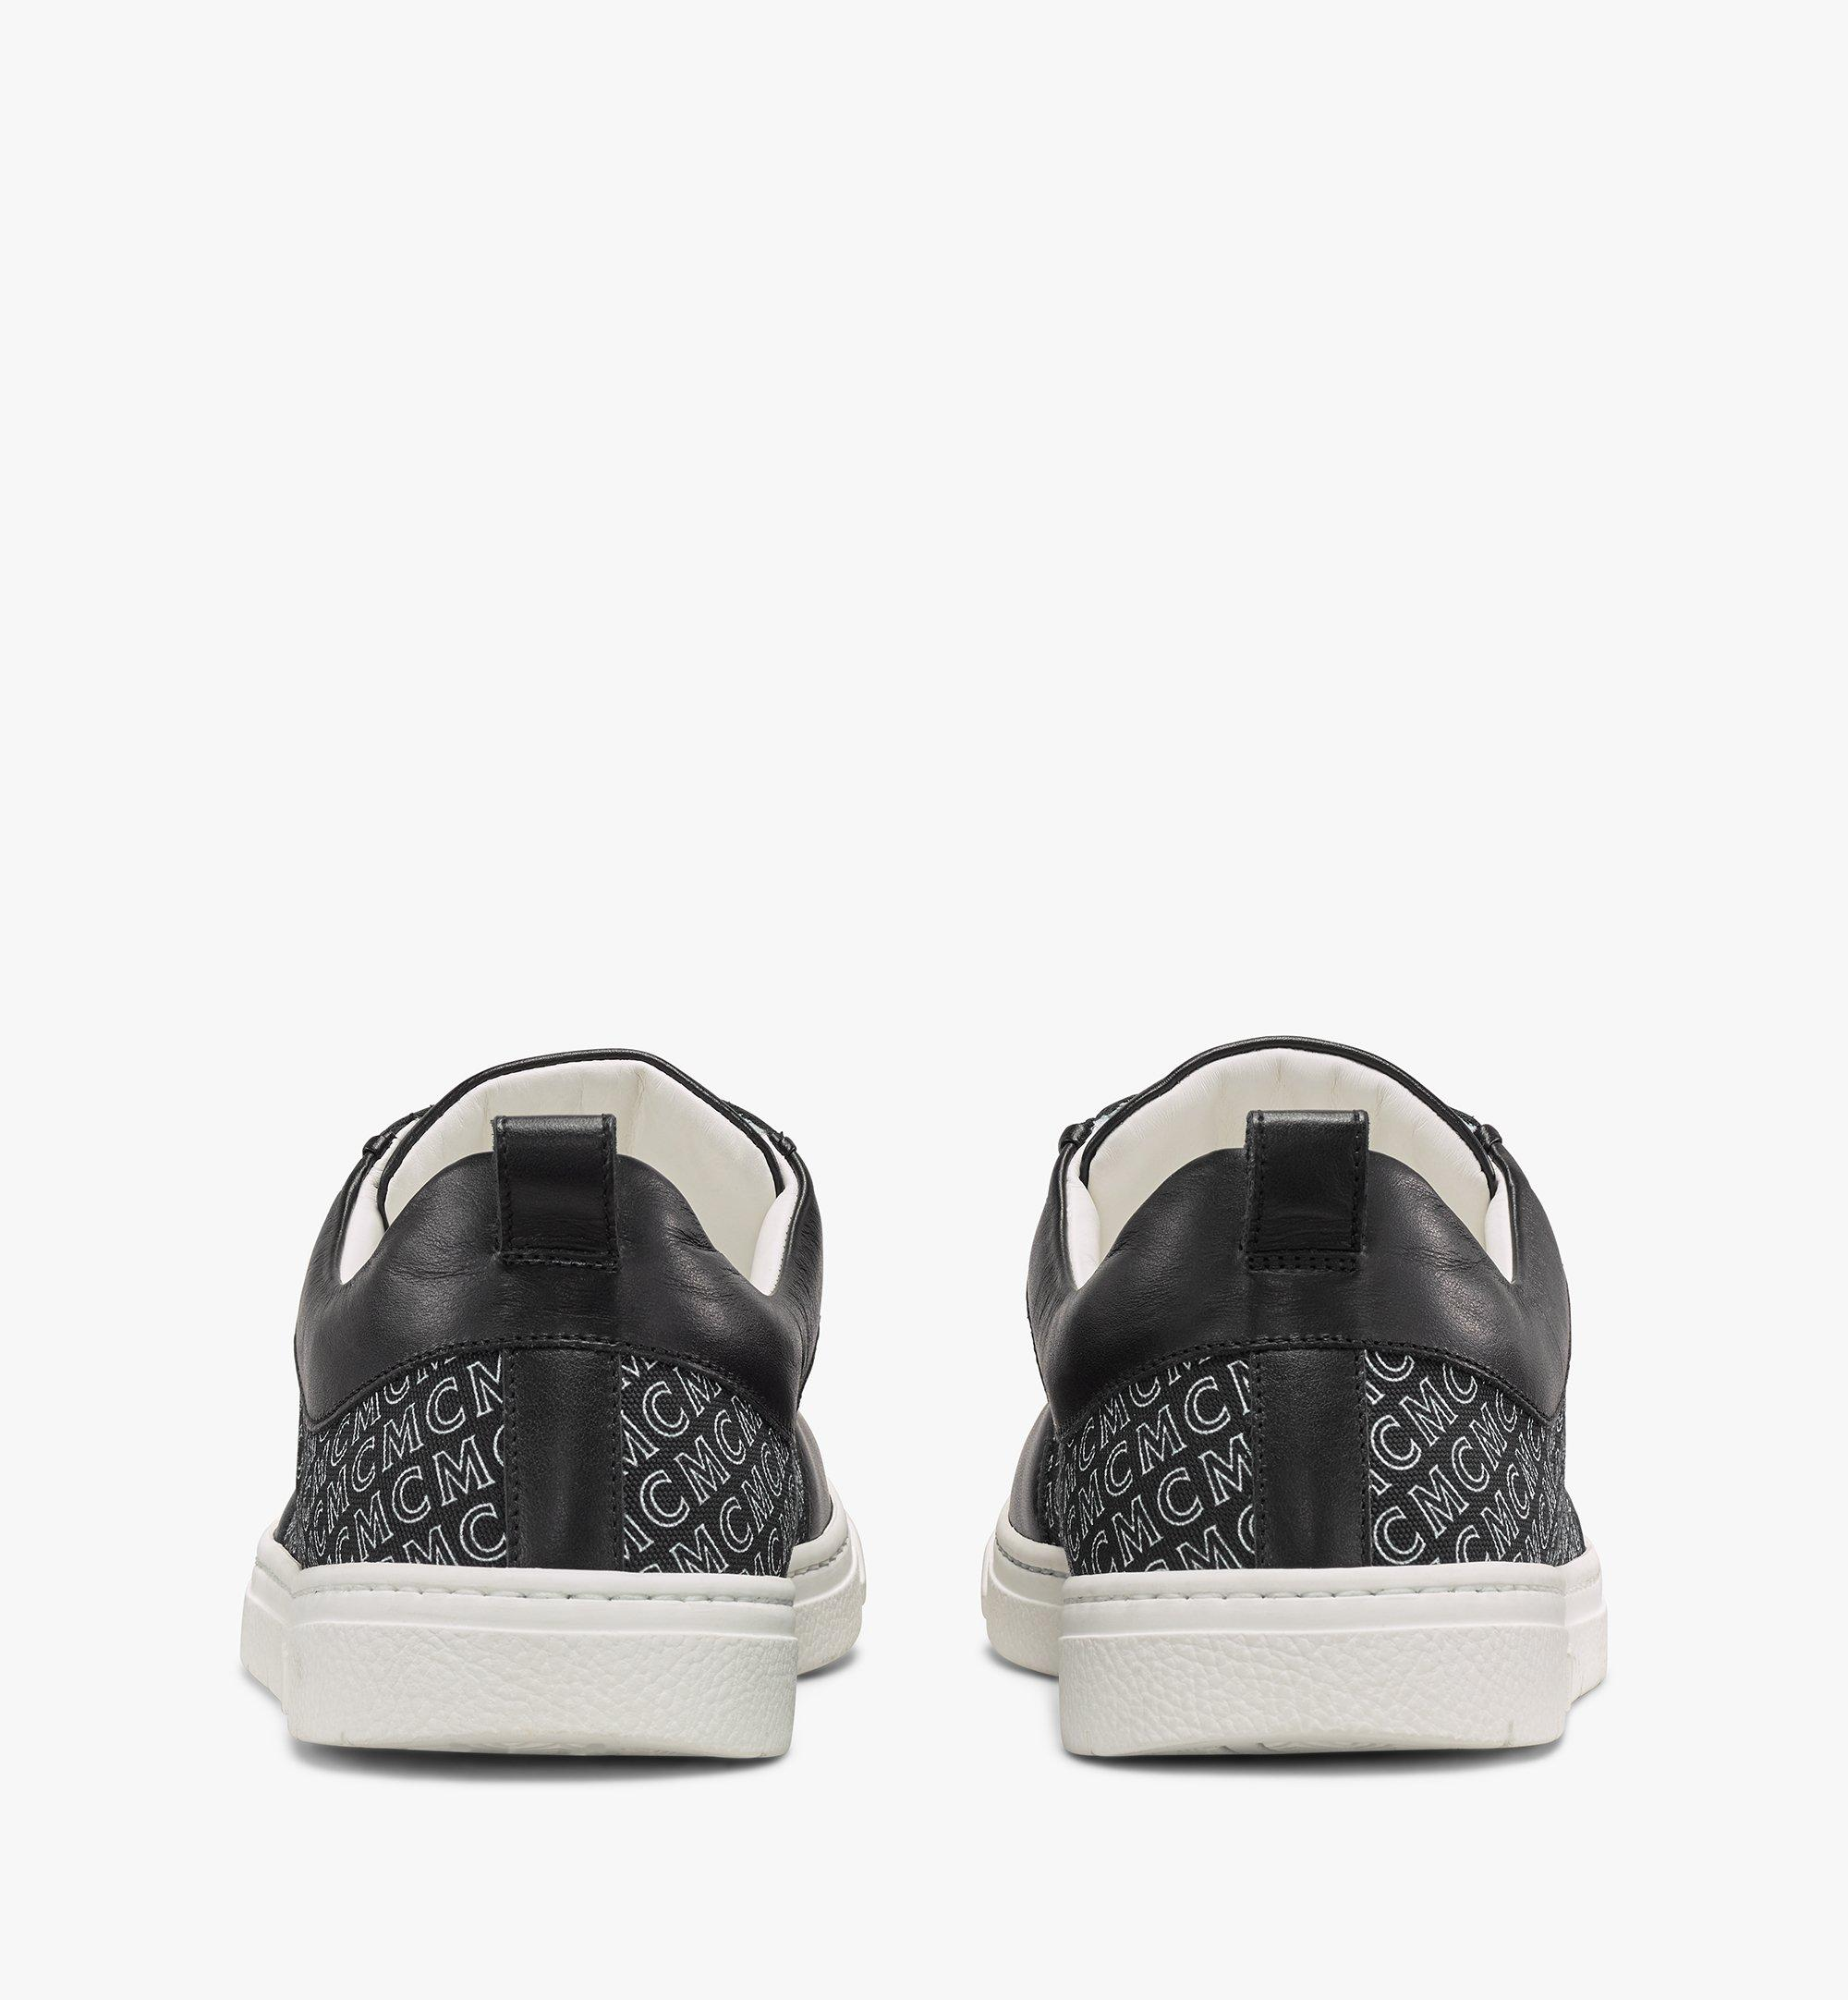 MCM 男士斜紋帆布花押字圖案低筒運動鞋 Black MEXAAMM12BK042 更多視圖 1